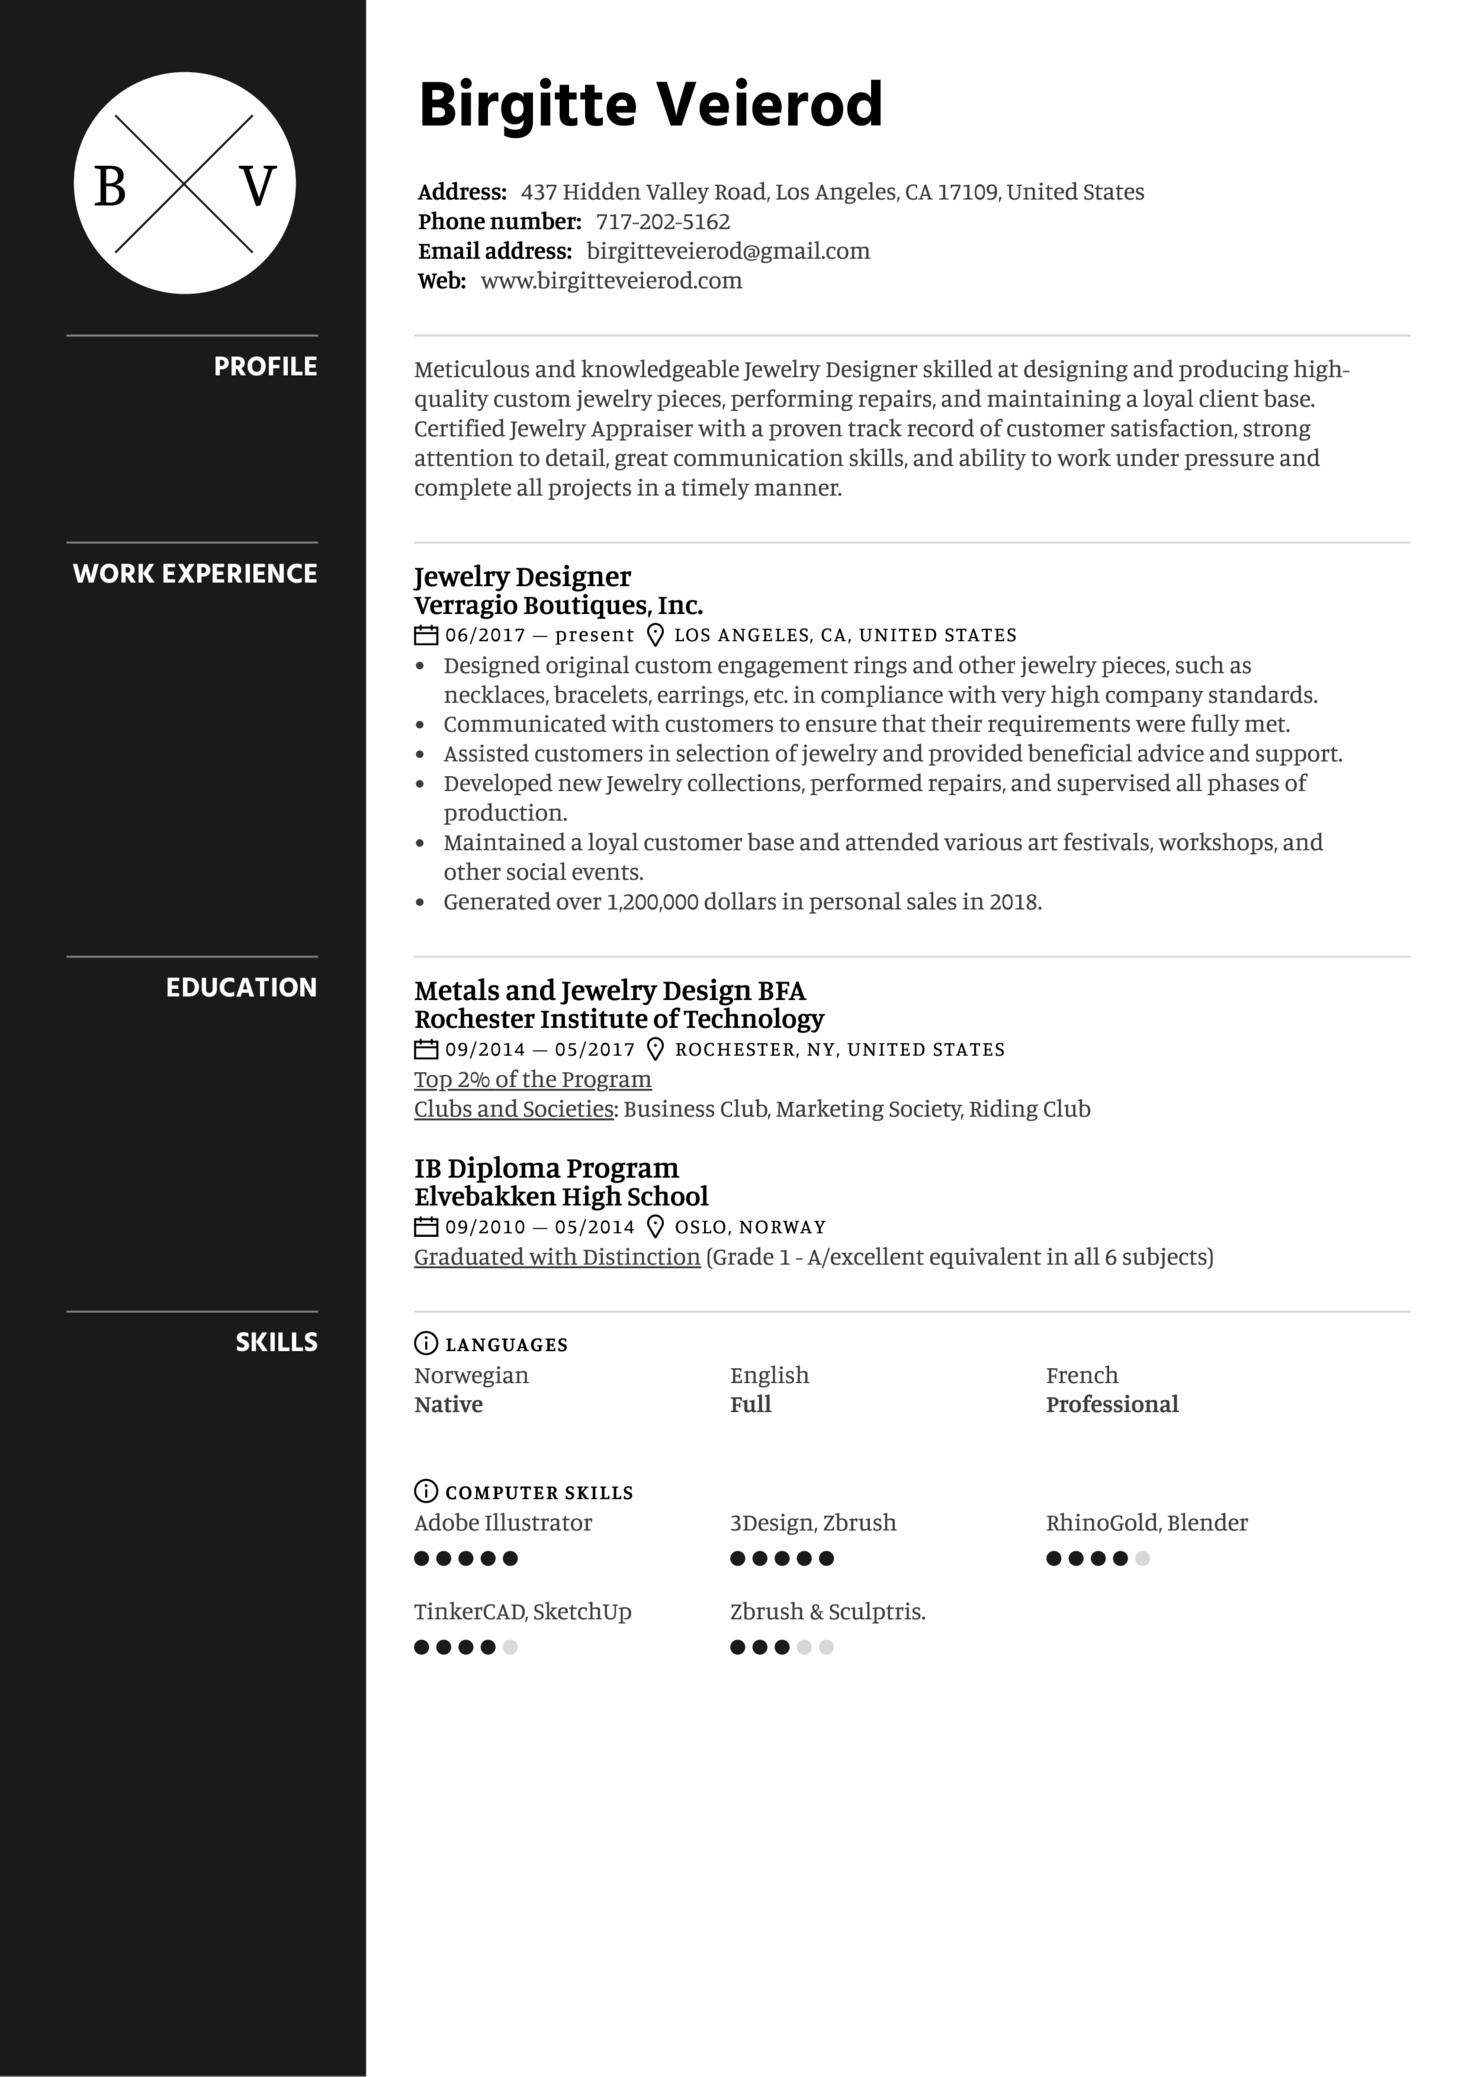 Jewelry Designer Resume Sample (parte 1)